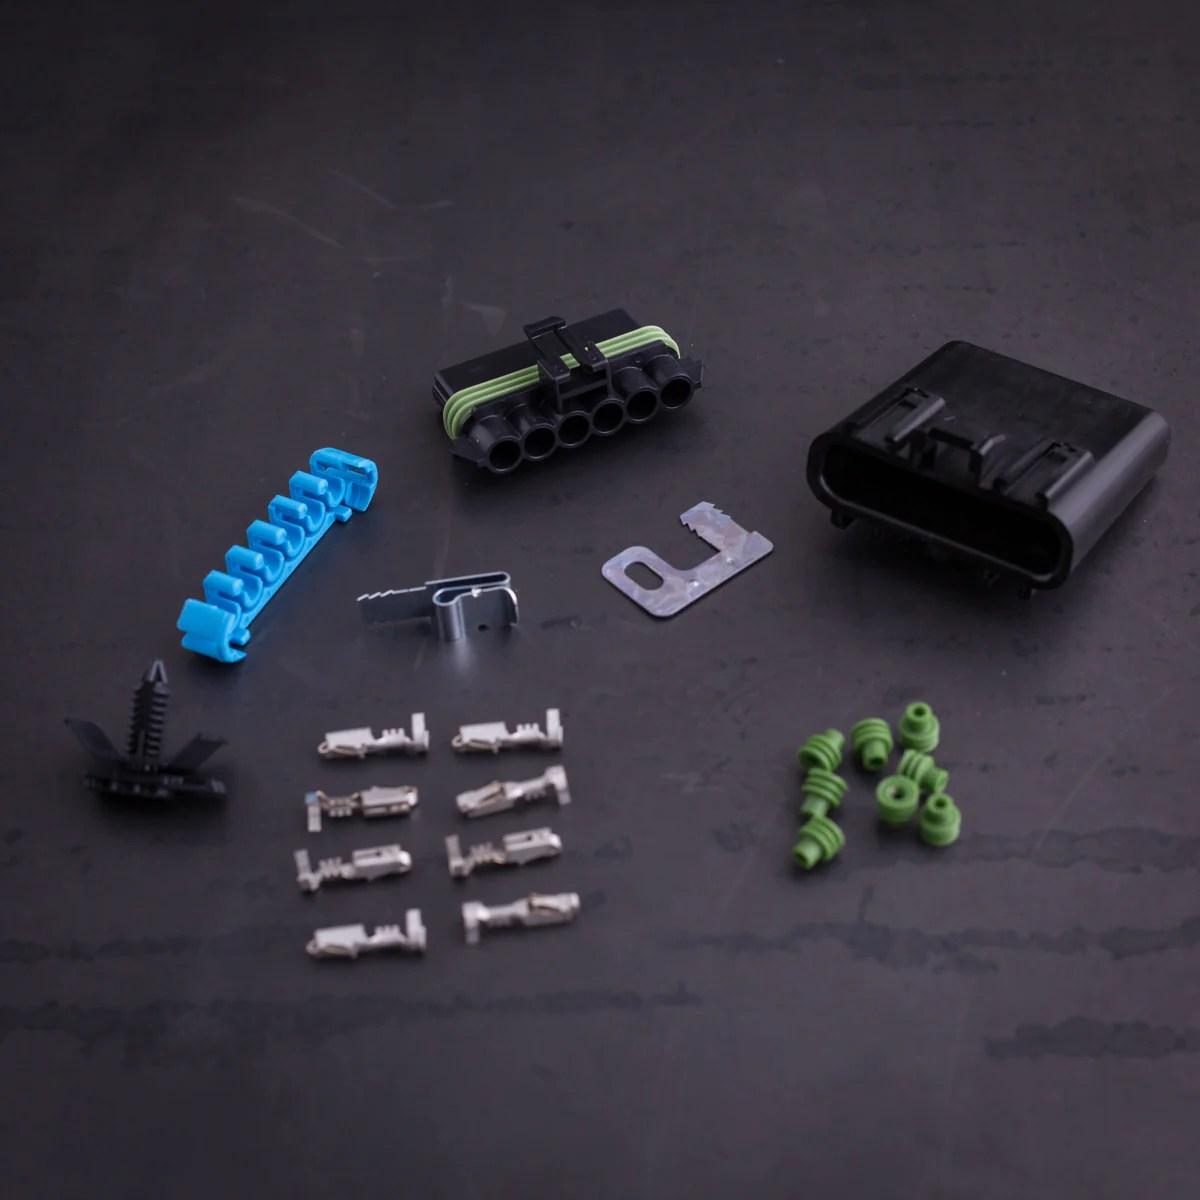 medium resolution of fuse box on motorcycle